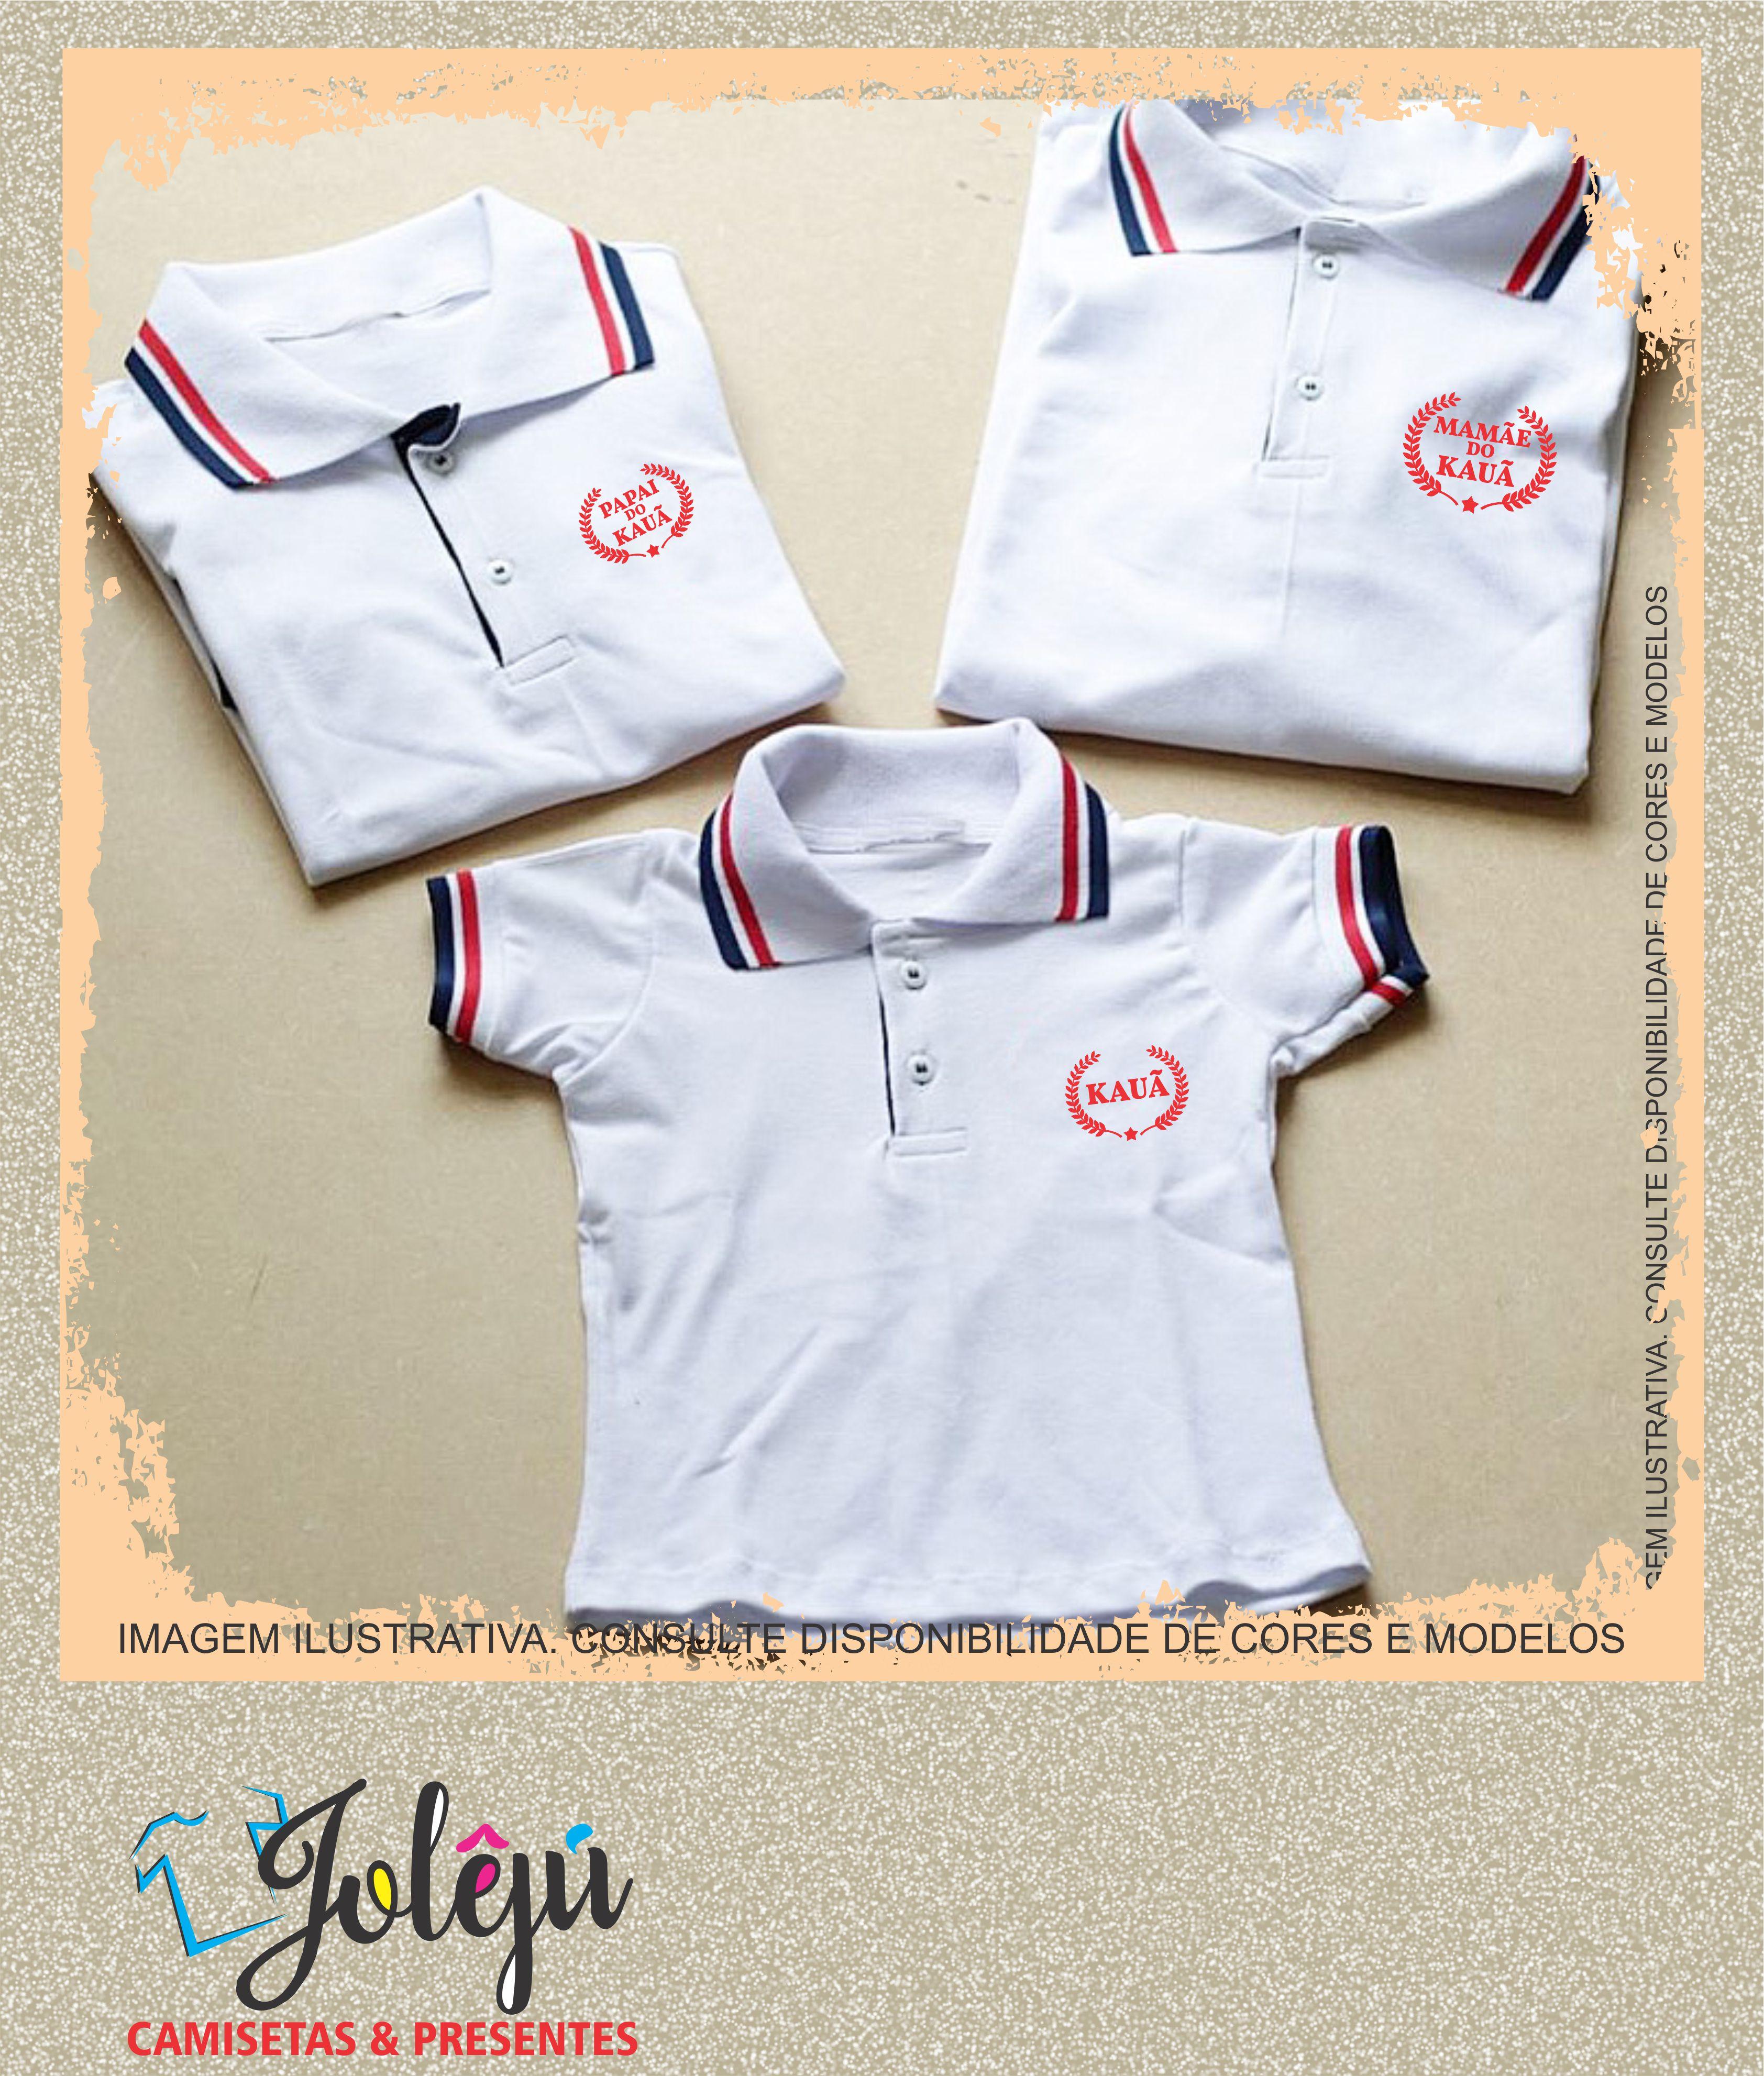 54353a94d5 Kit Camisetas Femininas Revenda 10 Pecas